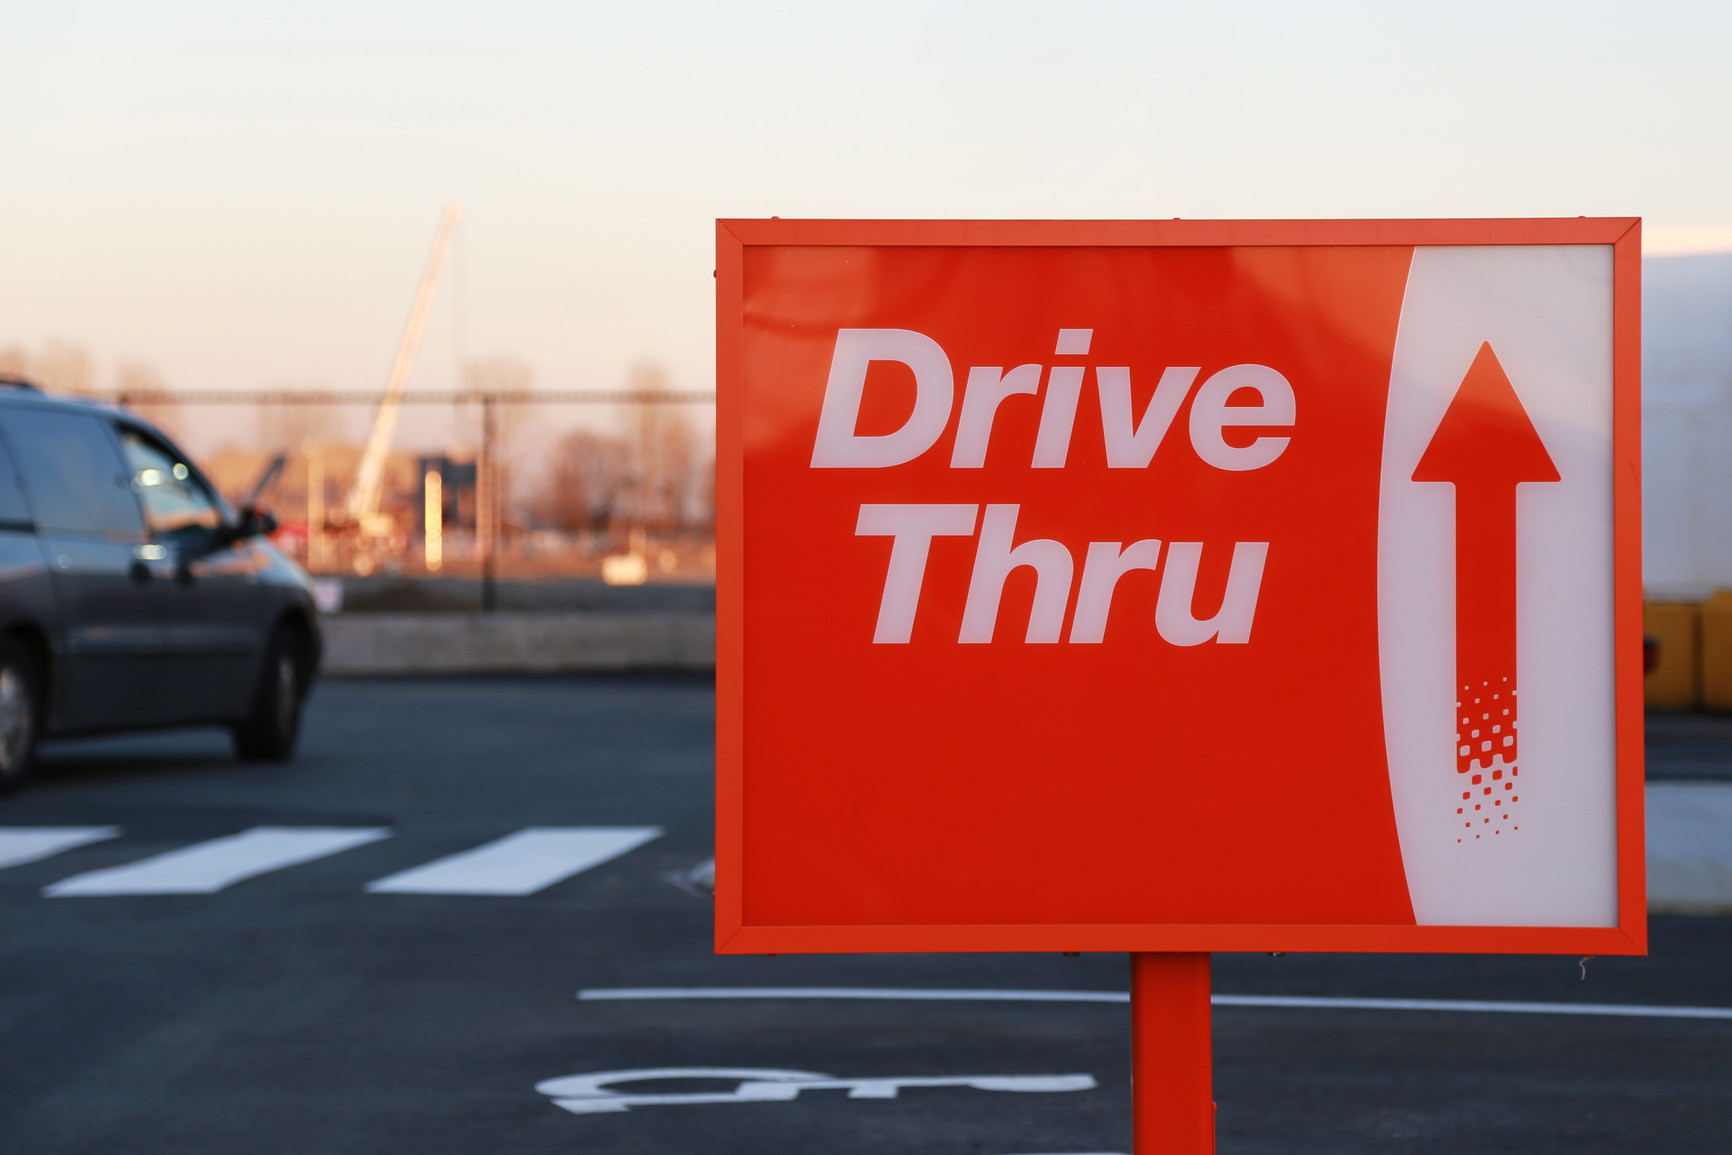 photodune-4560265-drive-thru-road-sign-m